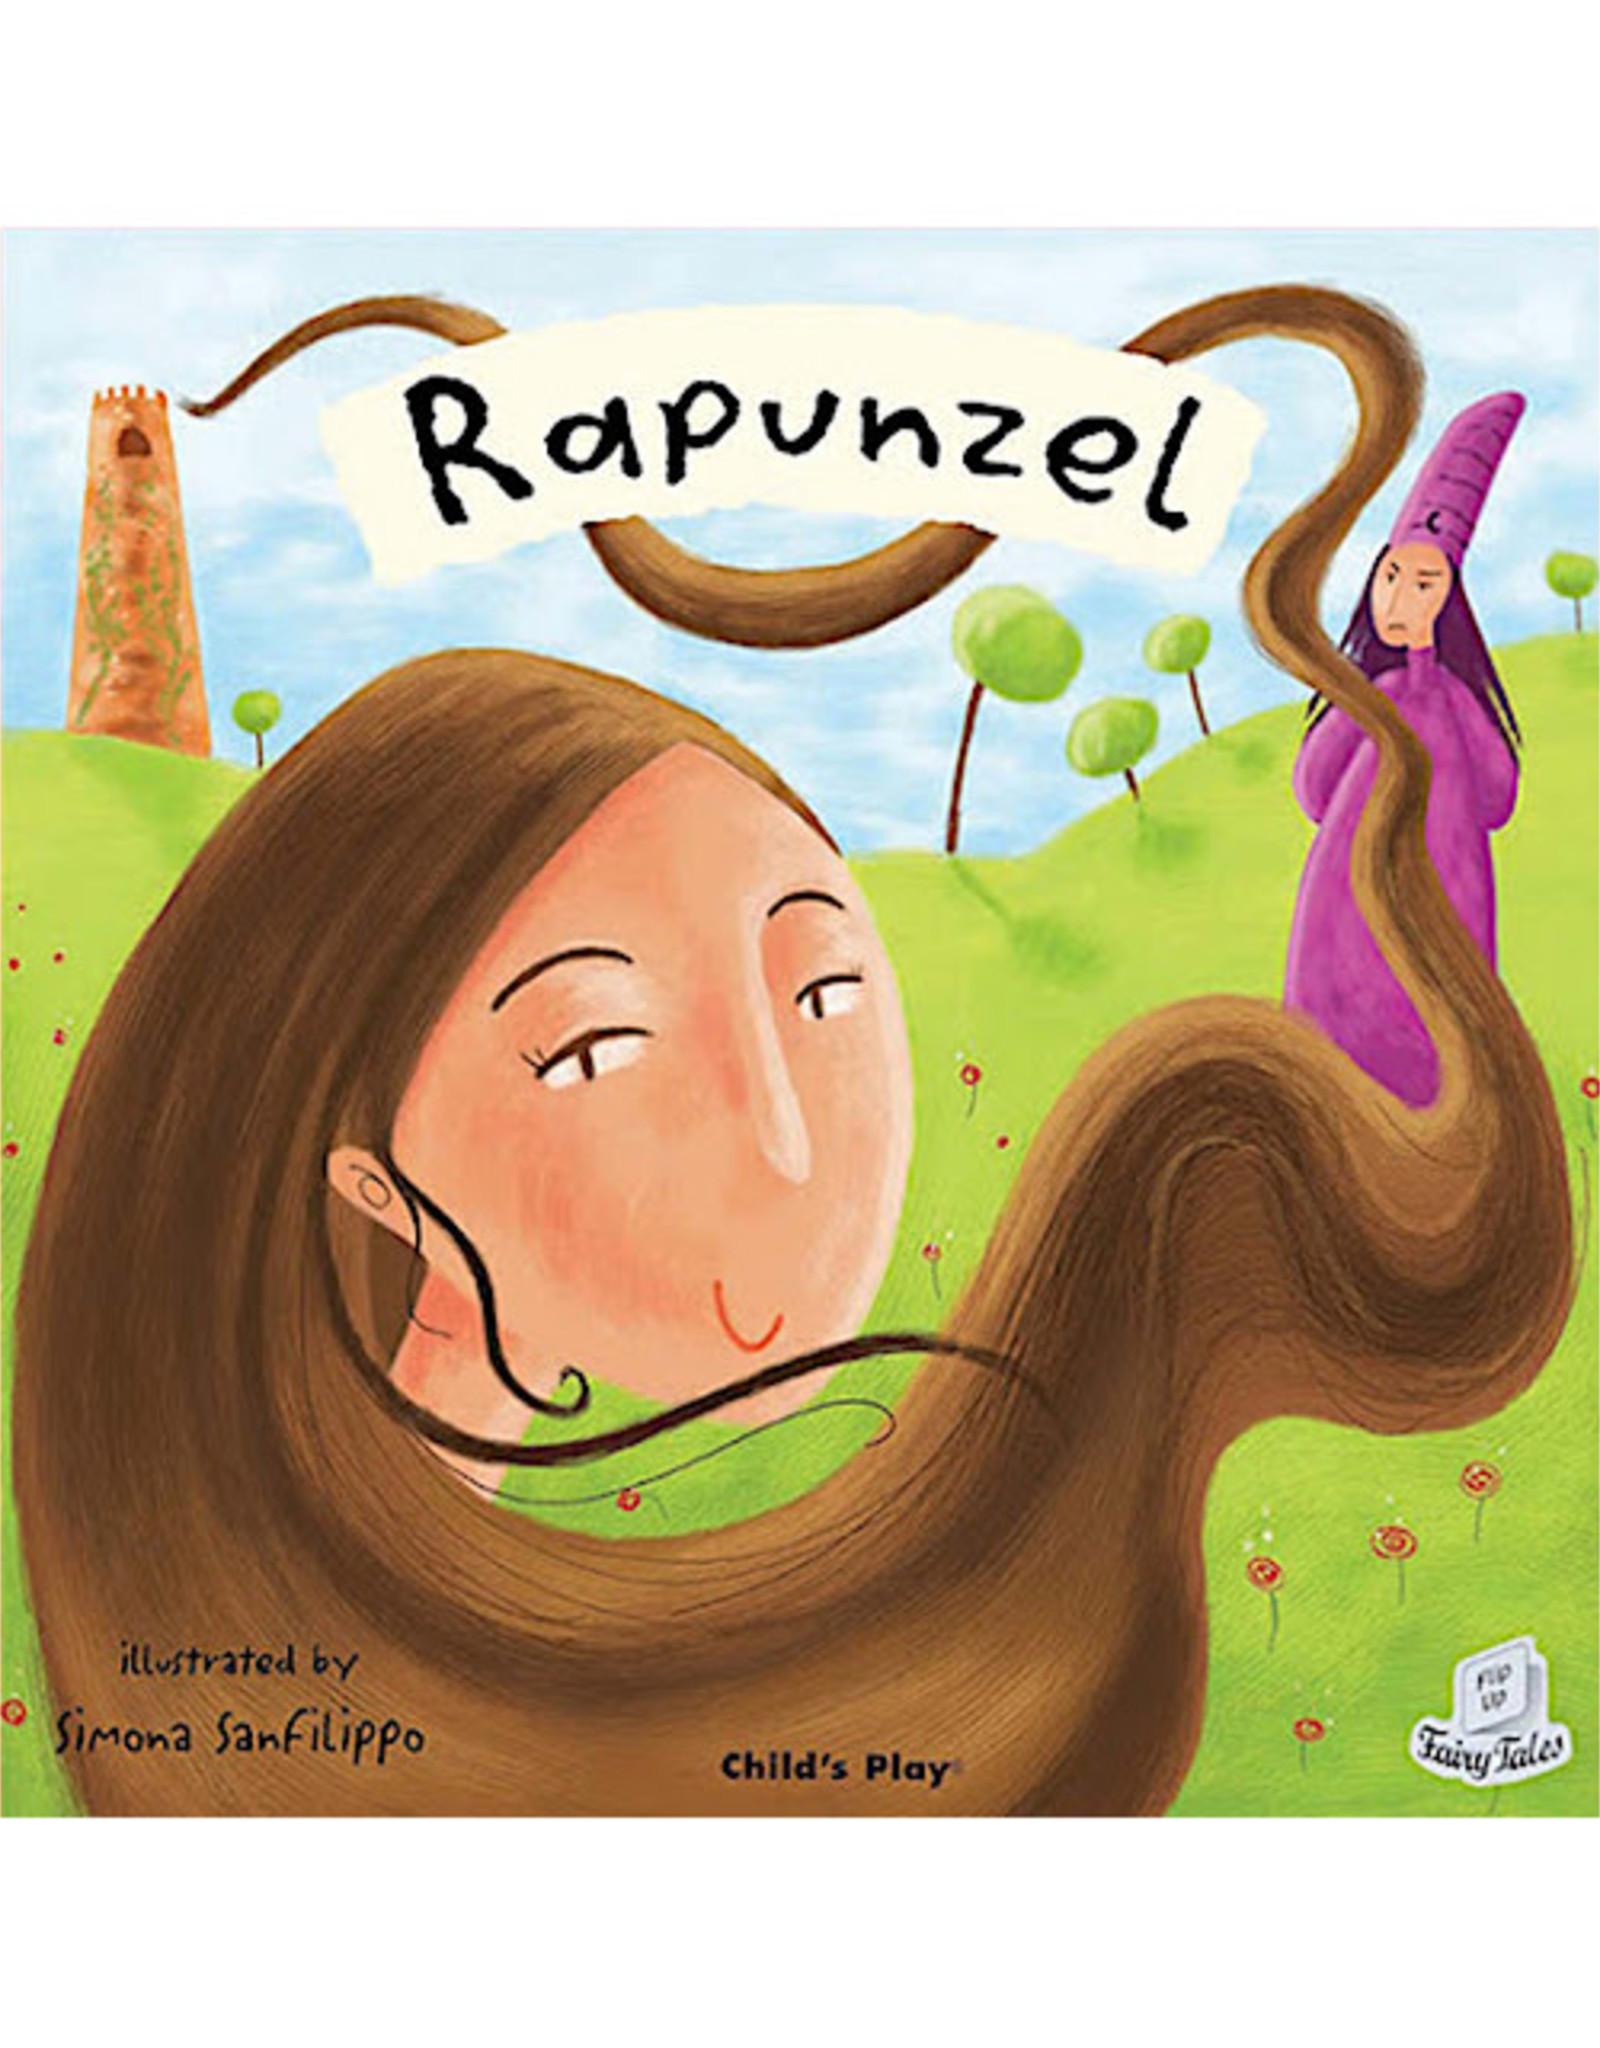 child's play Rapunzel